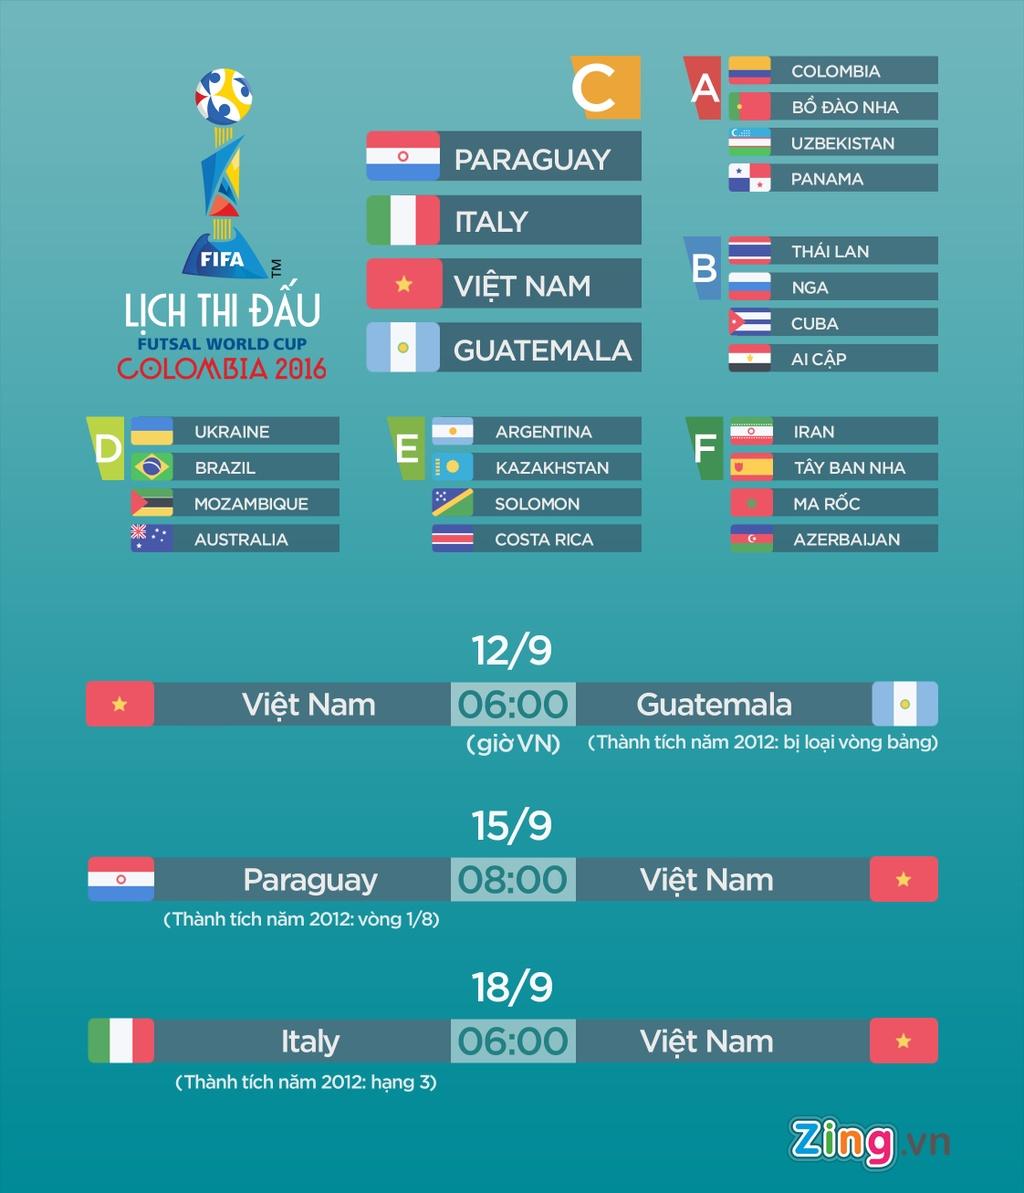 Tuyen futsal Viet Nam sang Colombia du World Cup hinh anh 7